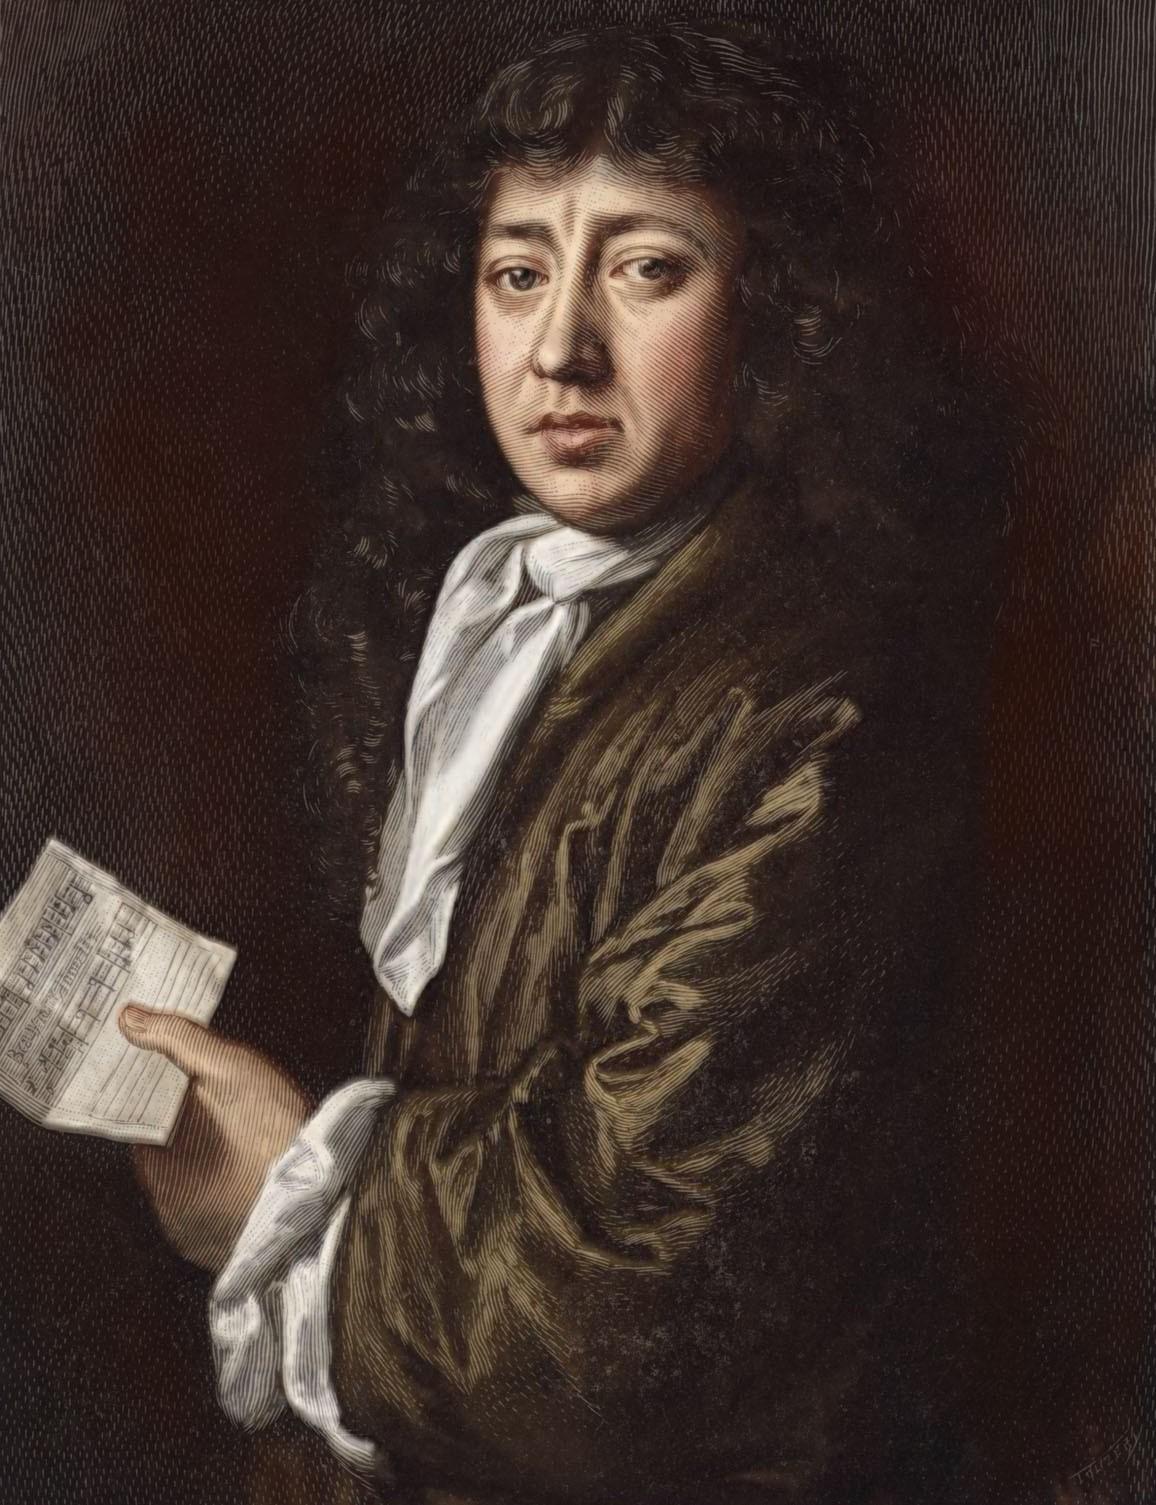 A portrait of Samuel Pepys